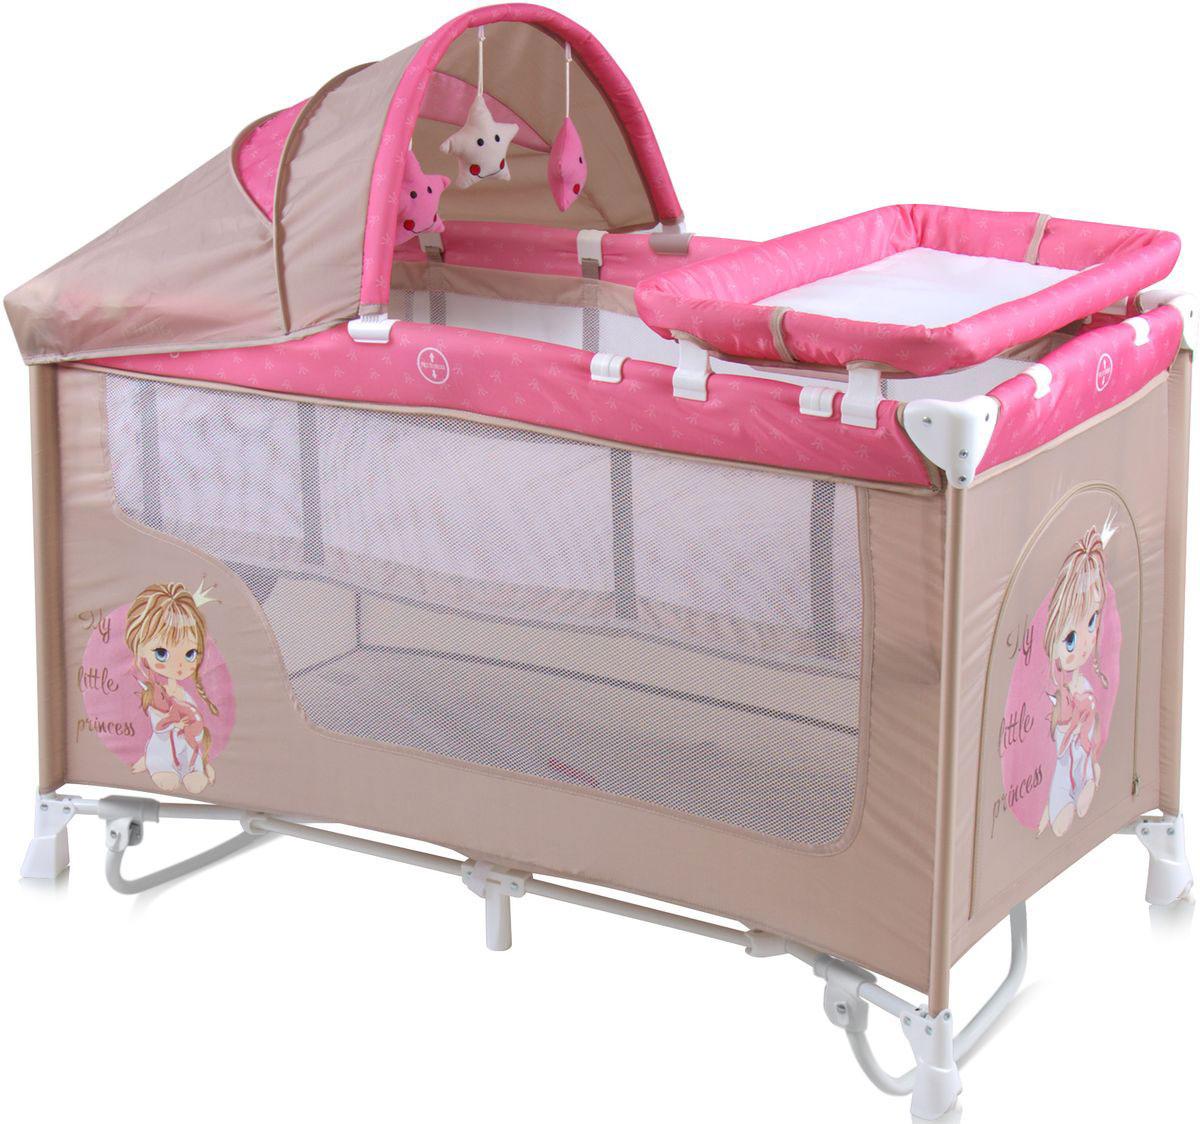 Lorelli Манеж-кроватка Nanny 2 Plus Rocker цвет бежевый розовый -  Детская комната